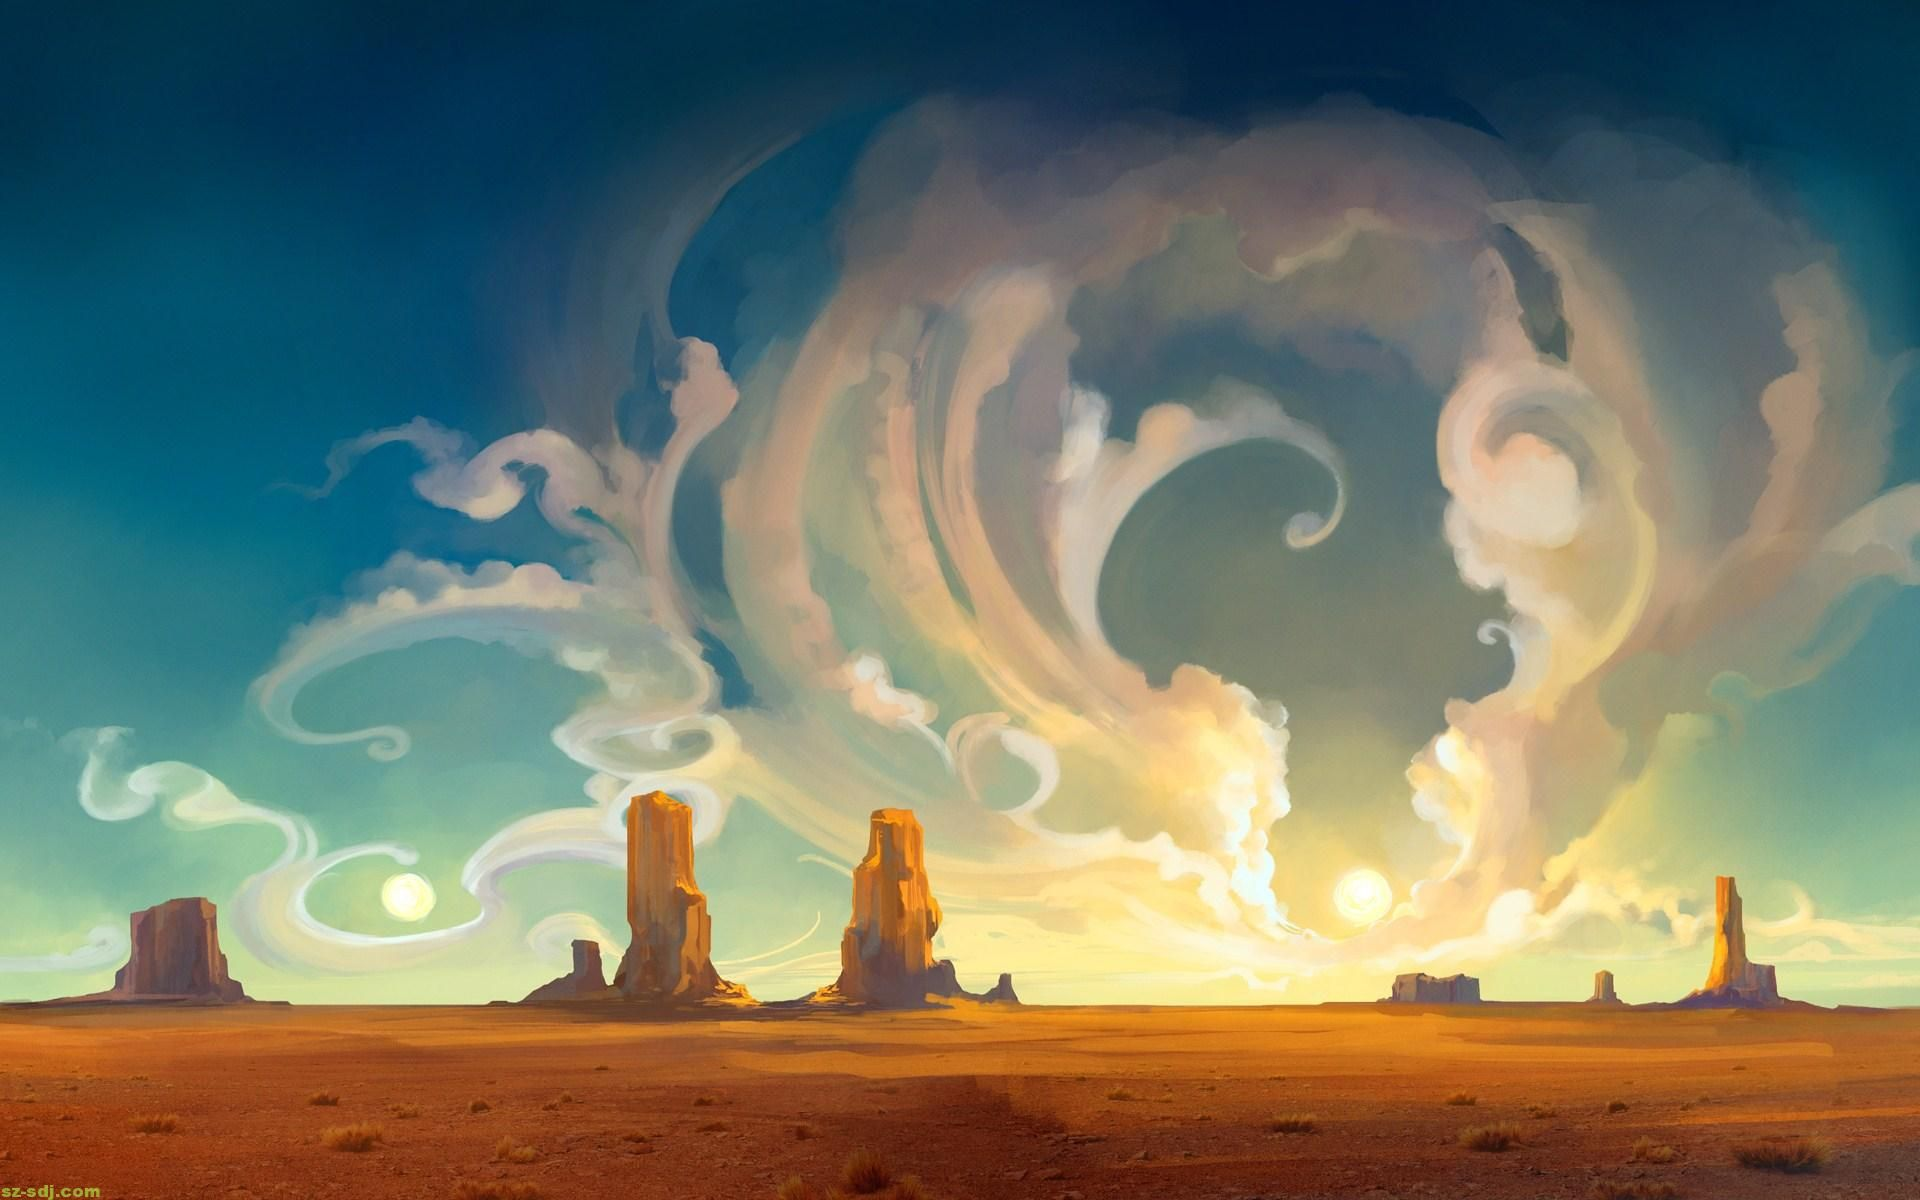 Beautiful Wallpaper Mountain Art - 239dd4b1675f501ef73f37ea39b69a81  You Should Have_369344.jpg